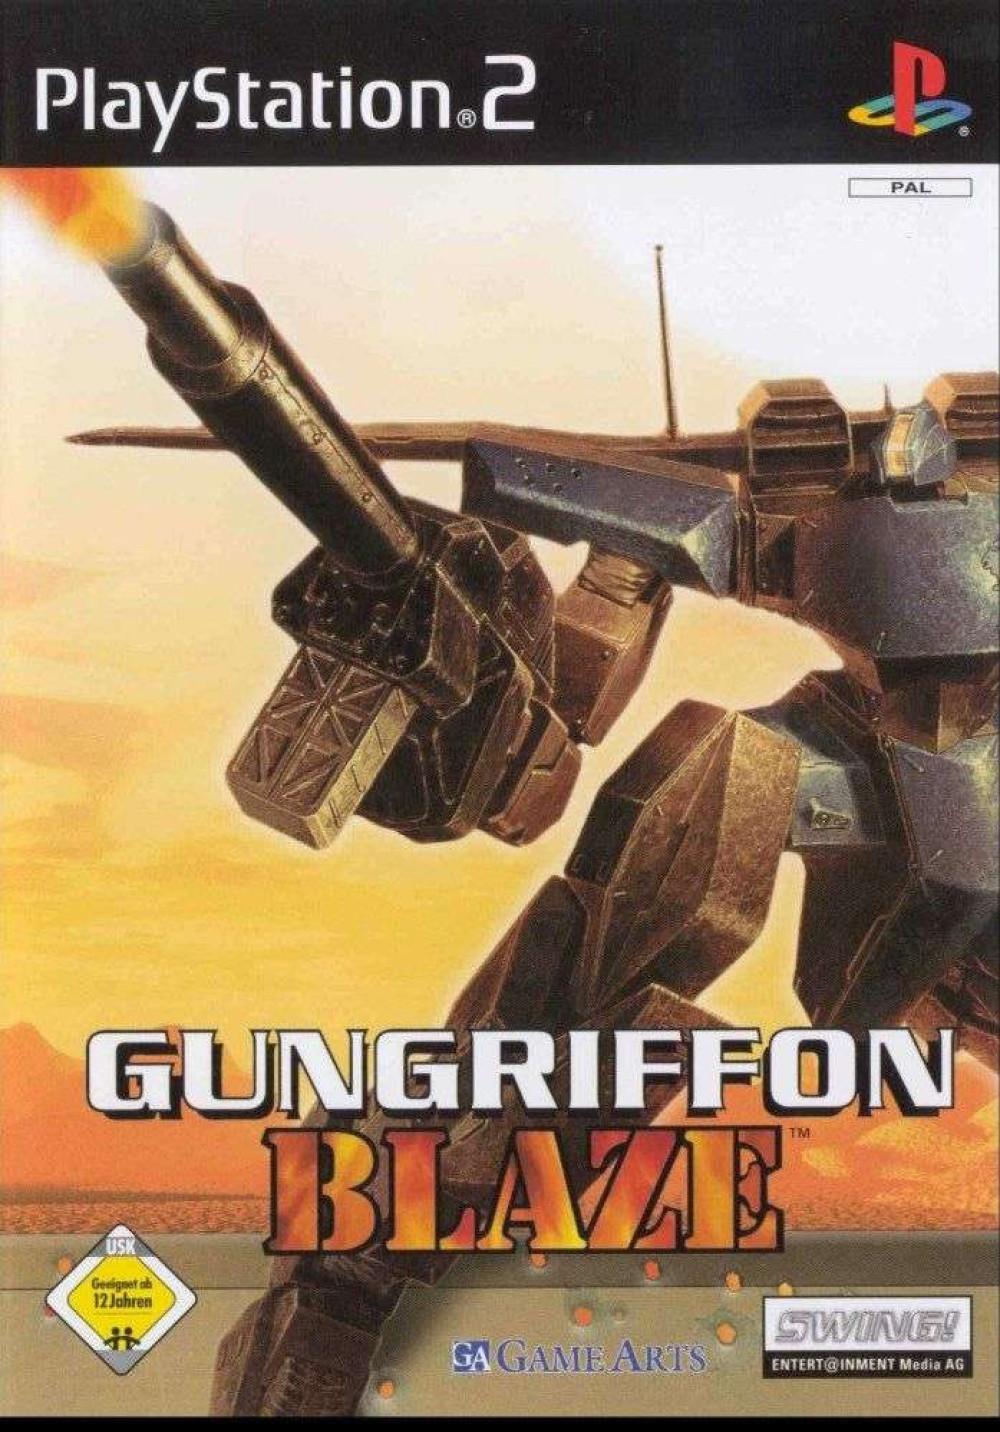 PS2 Gungriffon Blaze